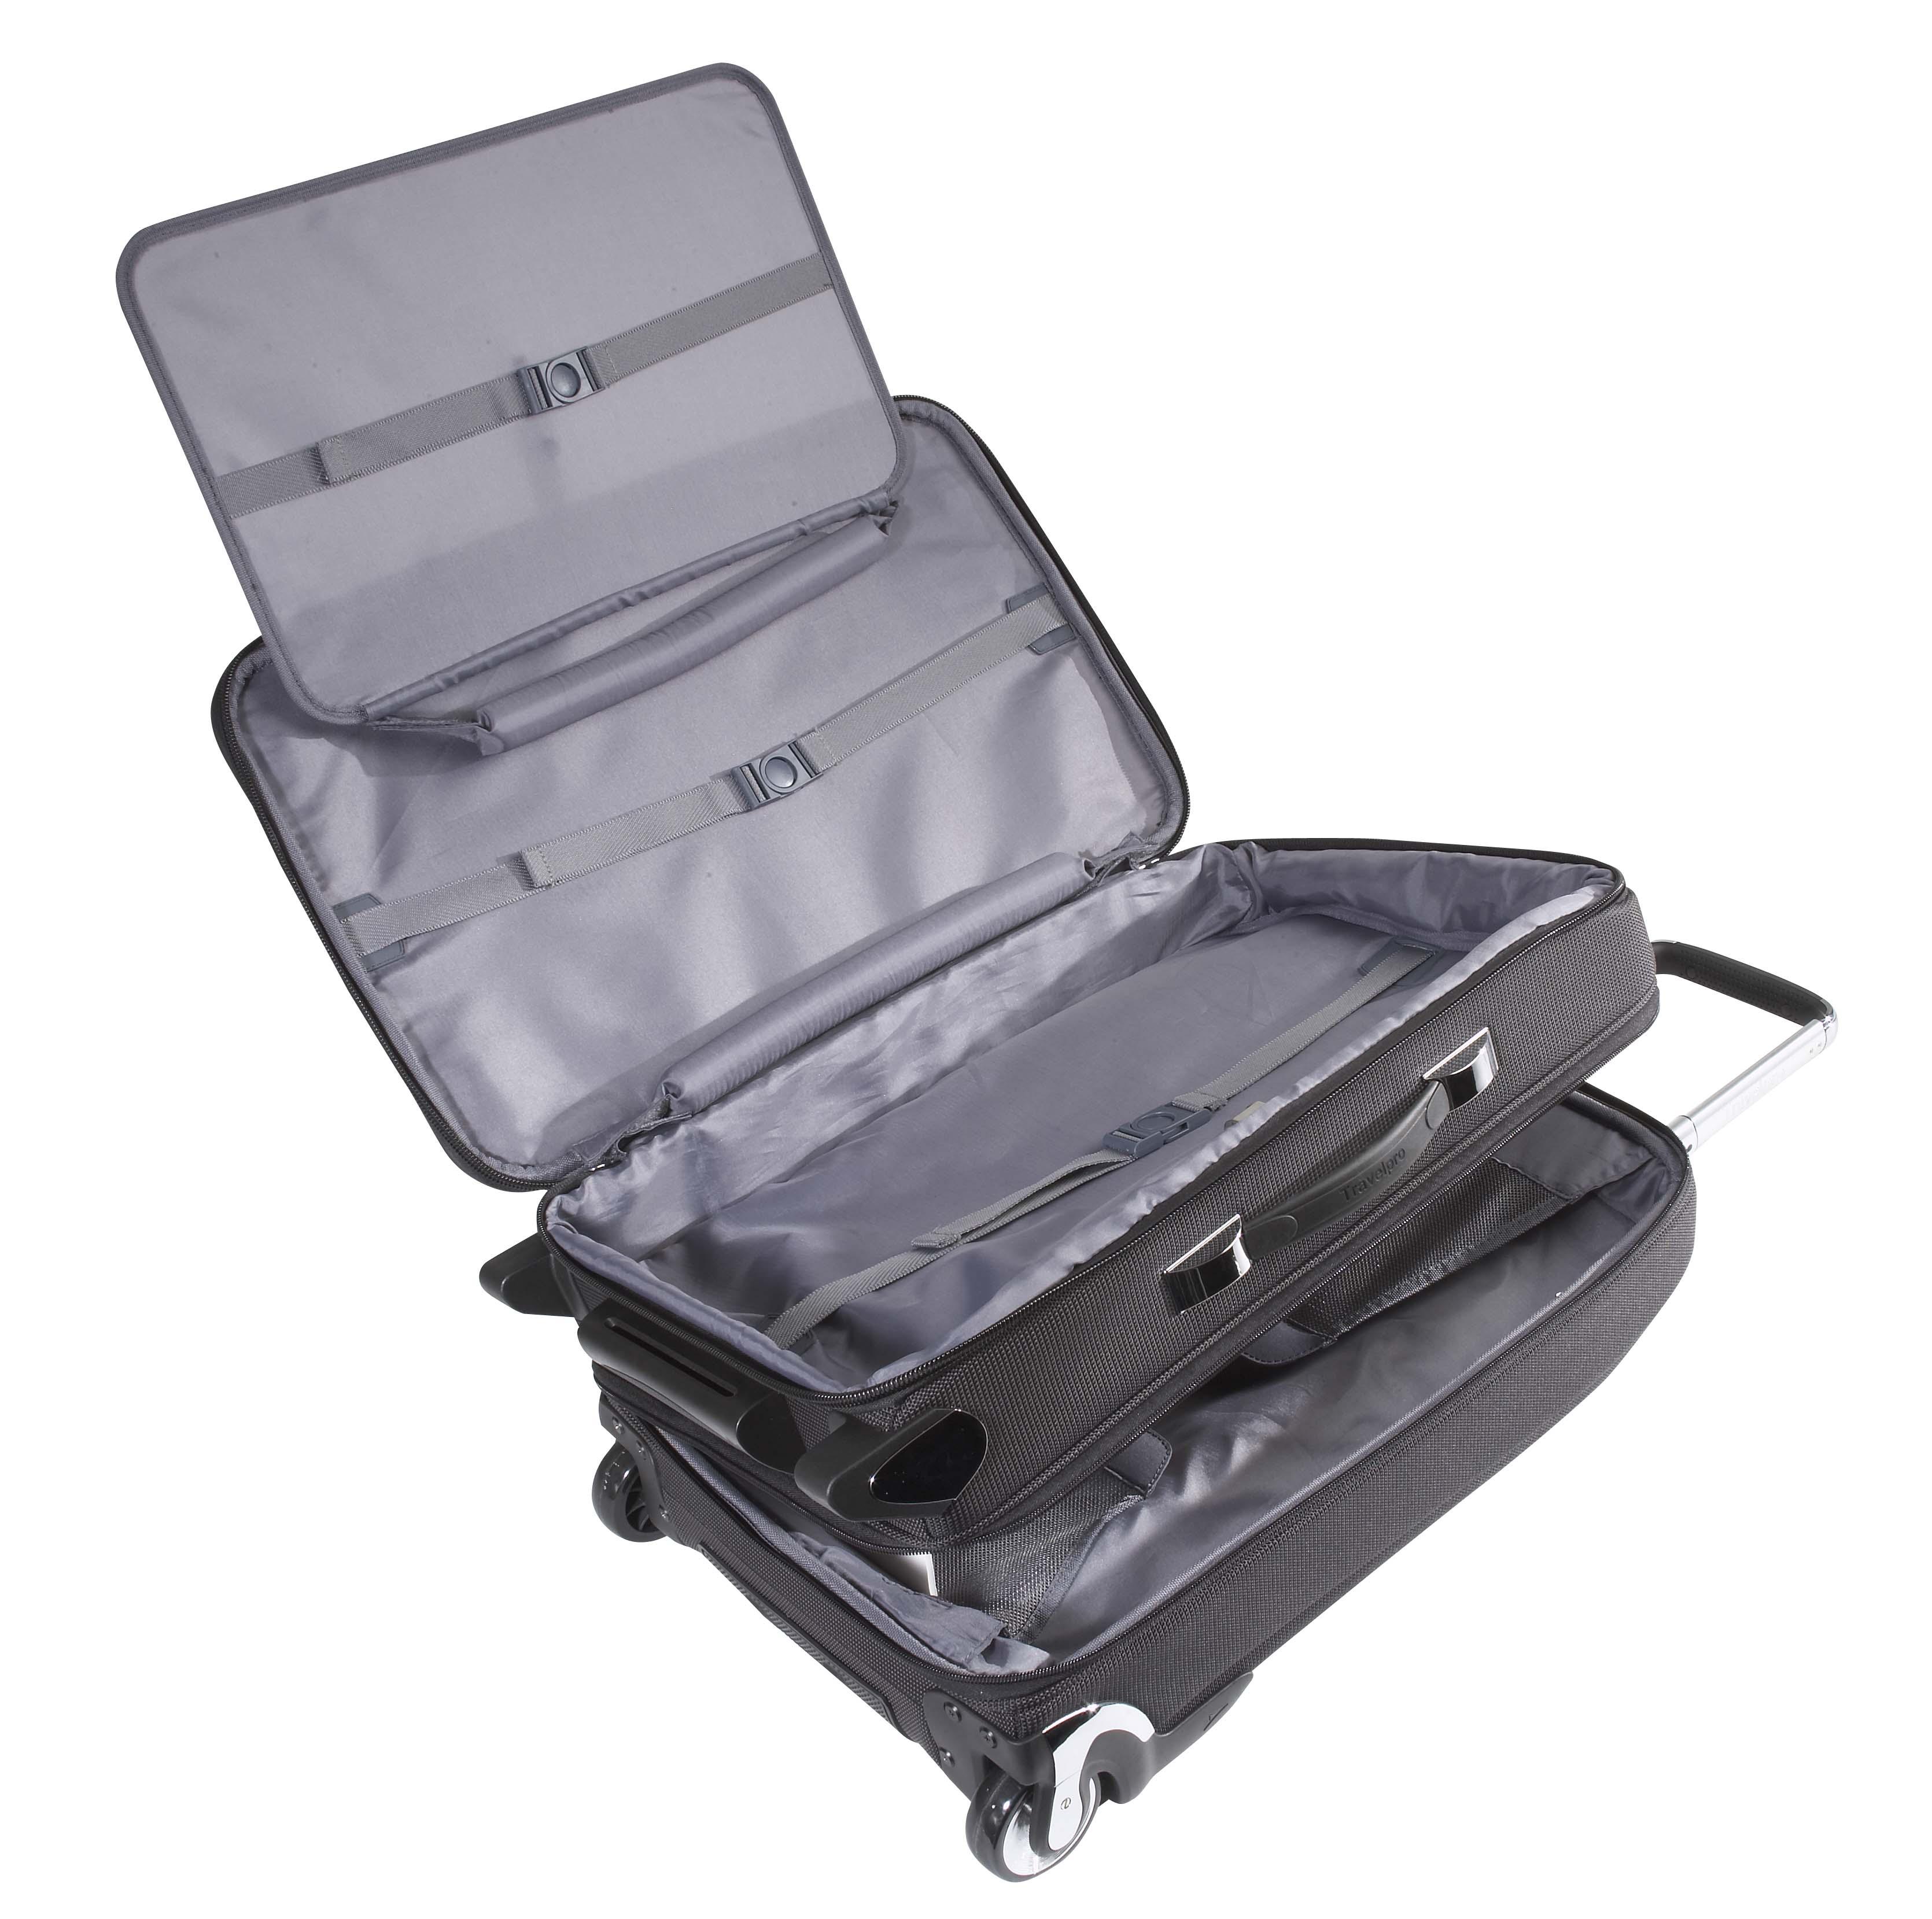 travelpro briefcase photo - 1